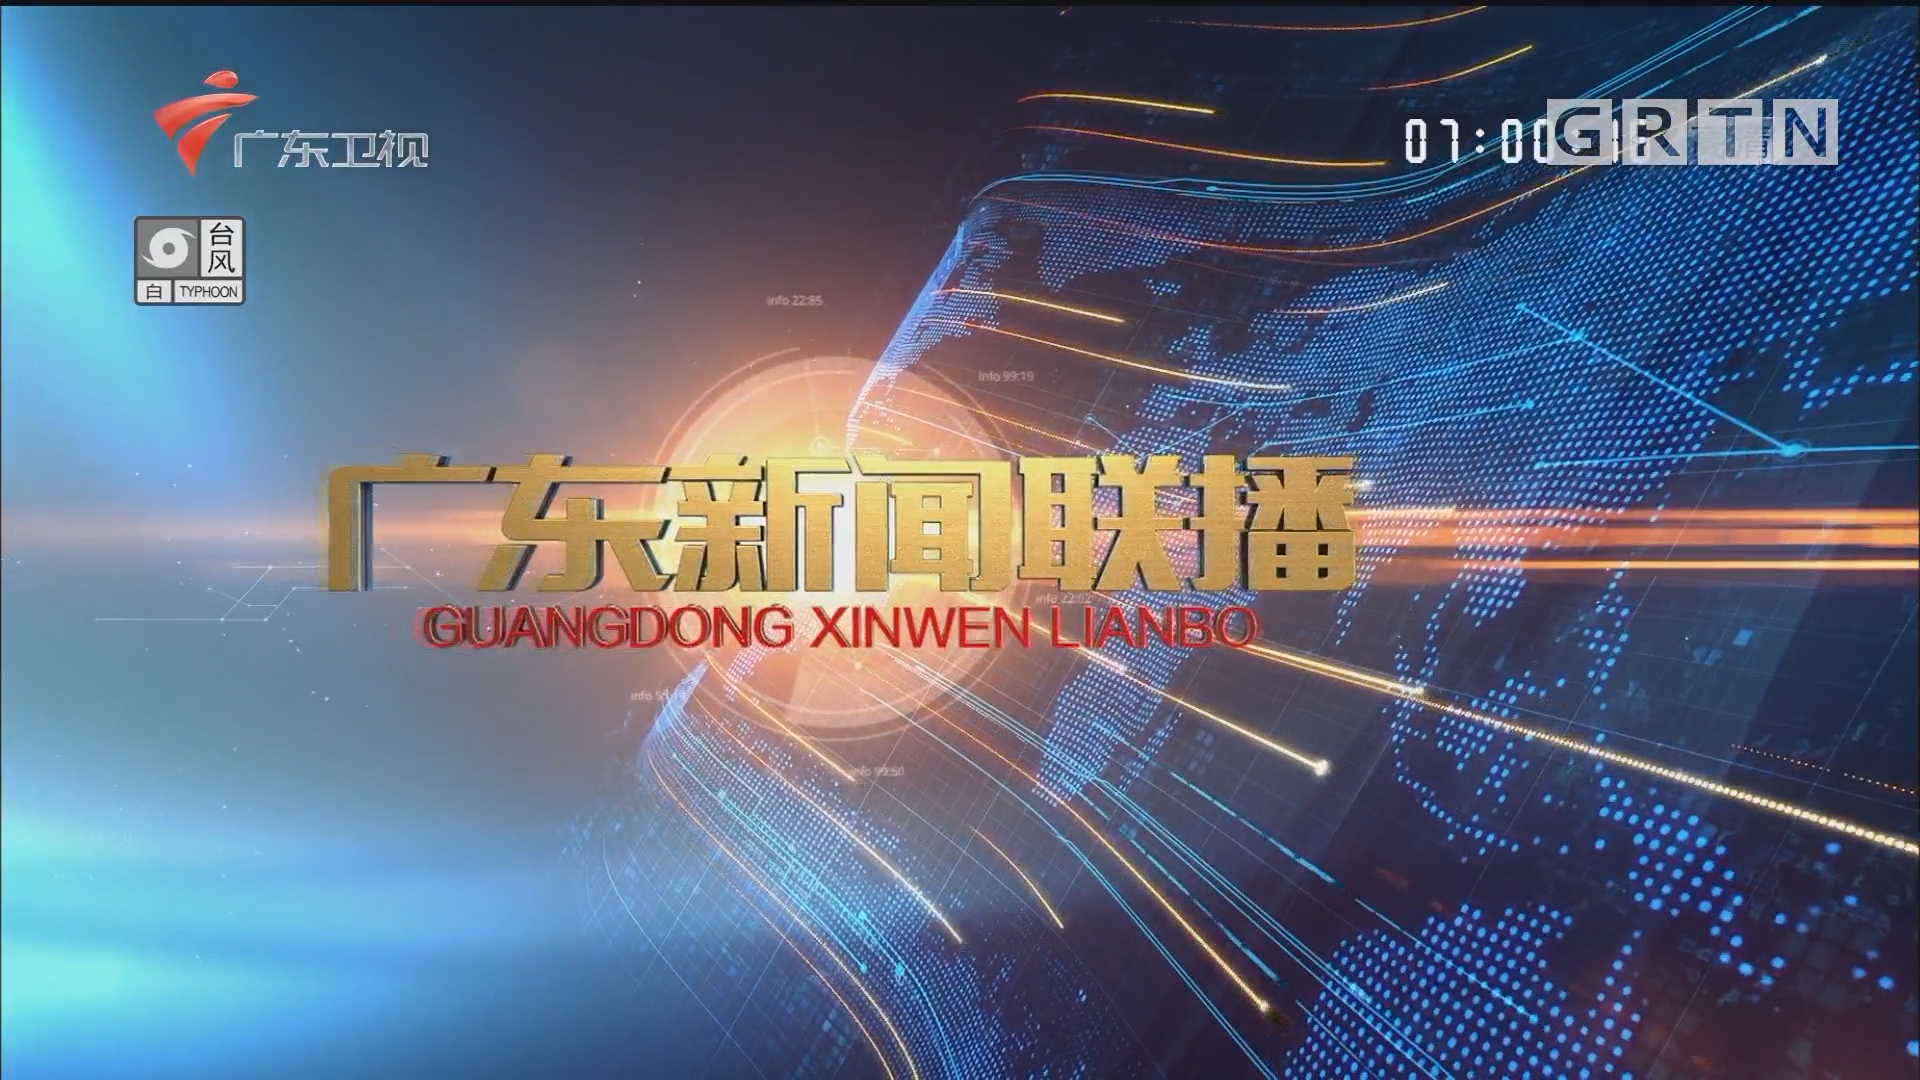 HD[2017-09-01]广东新闻联播:中共中央政治局会议建议 中国共产党第十九次全国代表大会10月18日在北京召开 中共中央总书记习近平主持会议